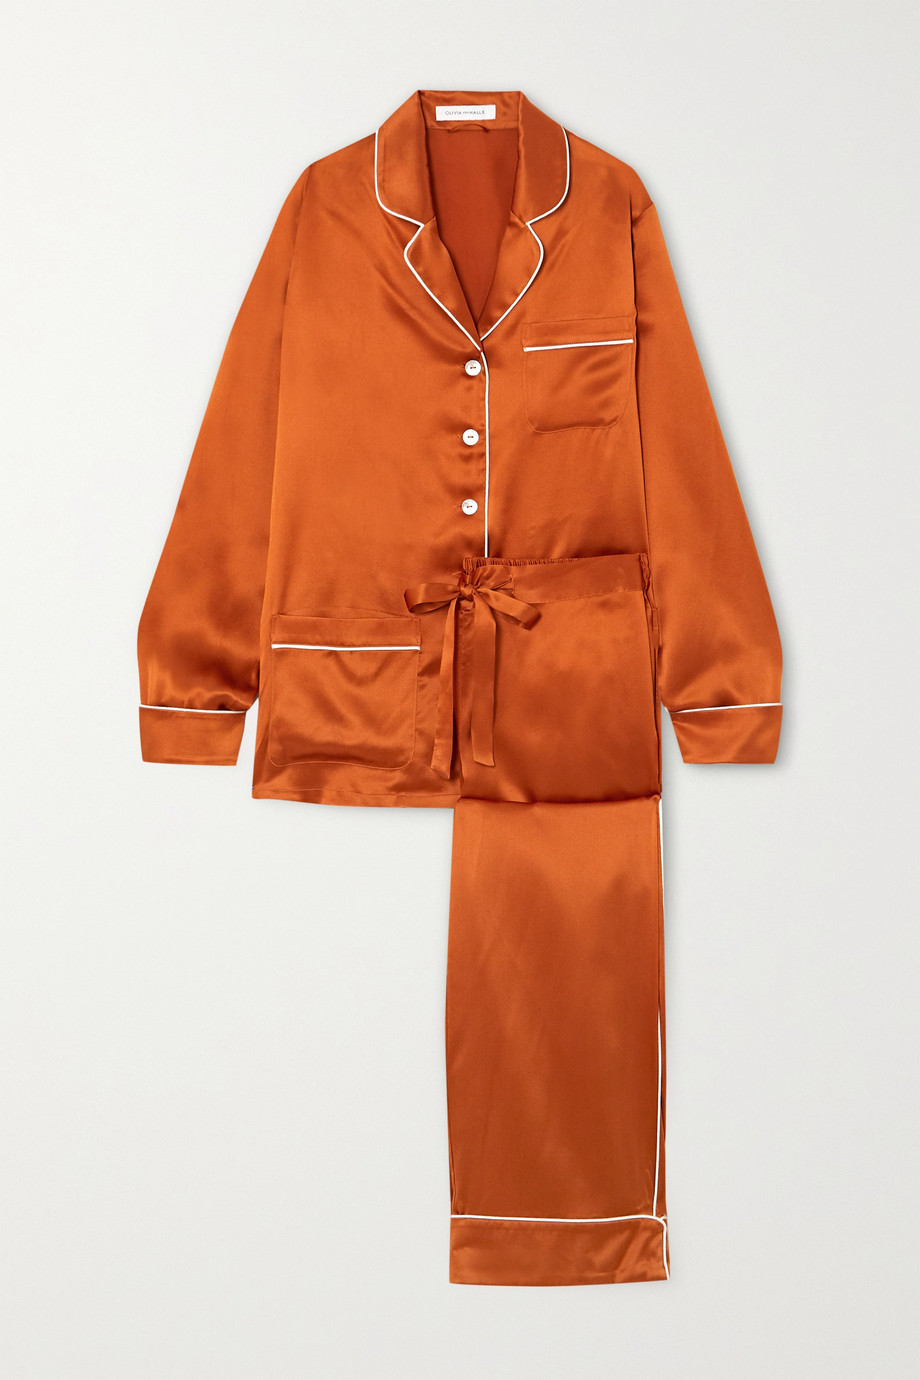 Olivia von Halle Coco silk-satin pajama set